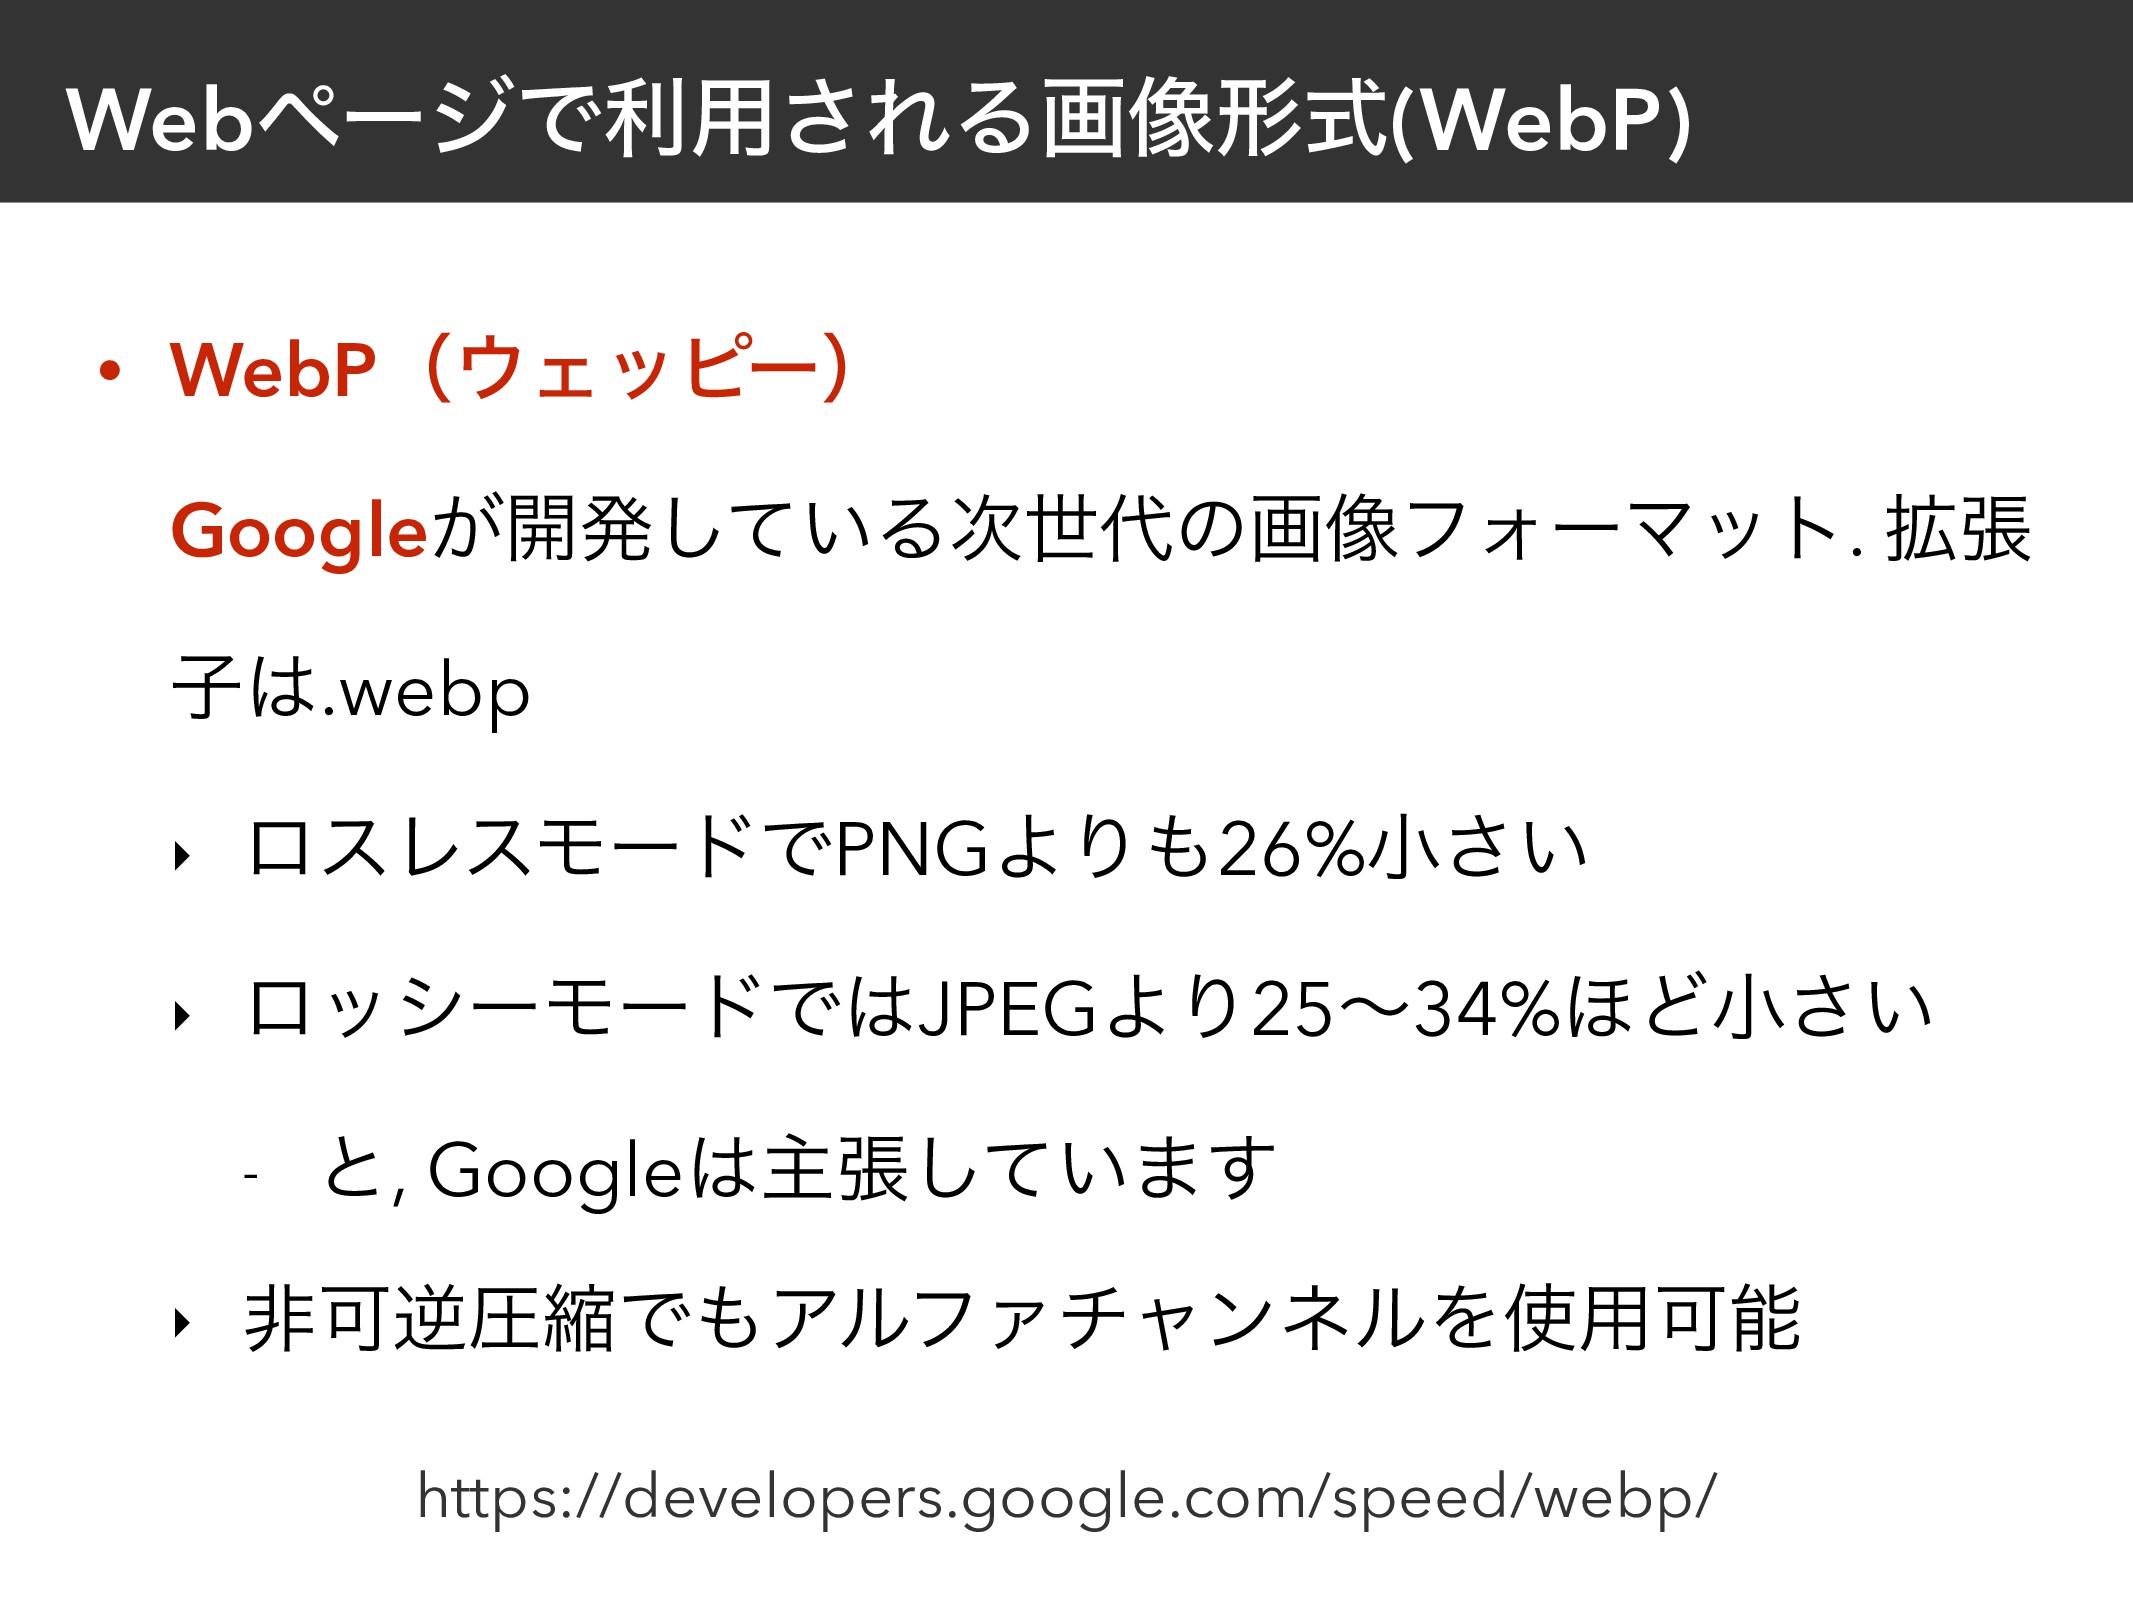 WebϖʔδͰར༻͞ΕΔը૾ܗࣜ(WebP) • WebPʢΣοϐʔʣ Google͕։ൃ...